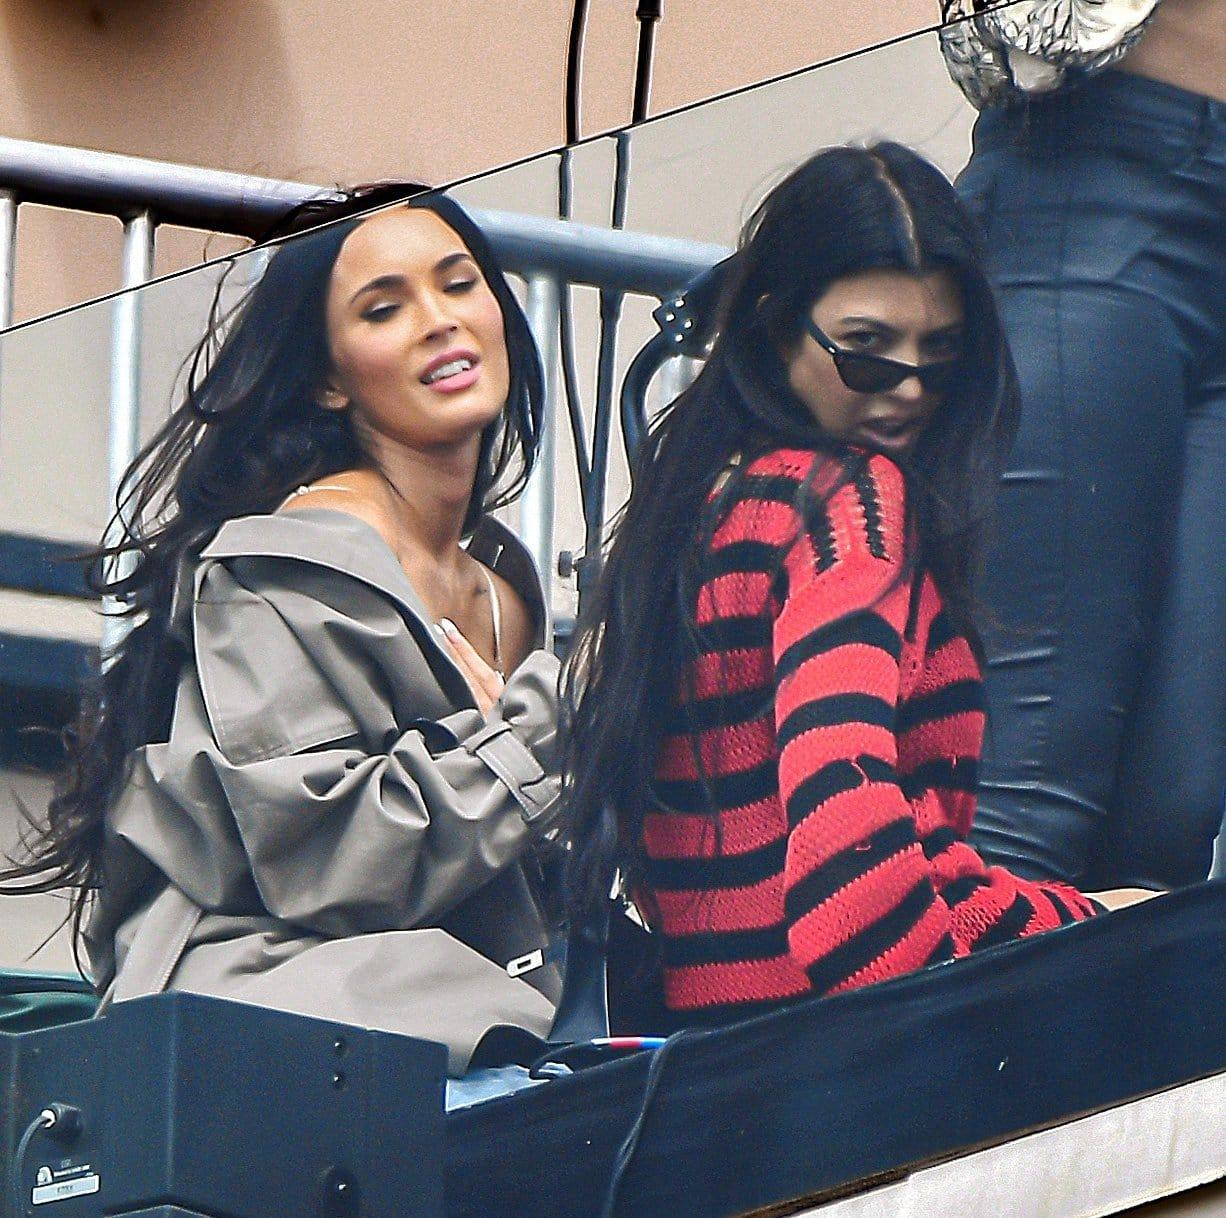 Kourtney Kardashian teams her red and black Raf Simons sweater with Prada chunky boots